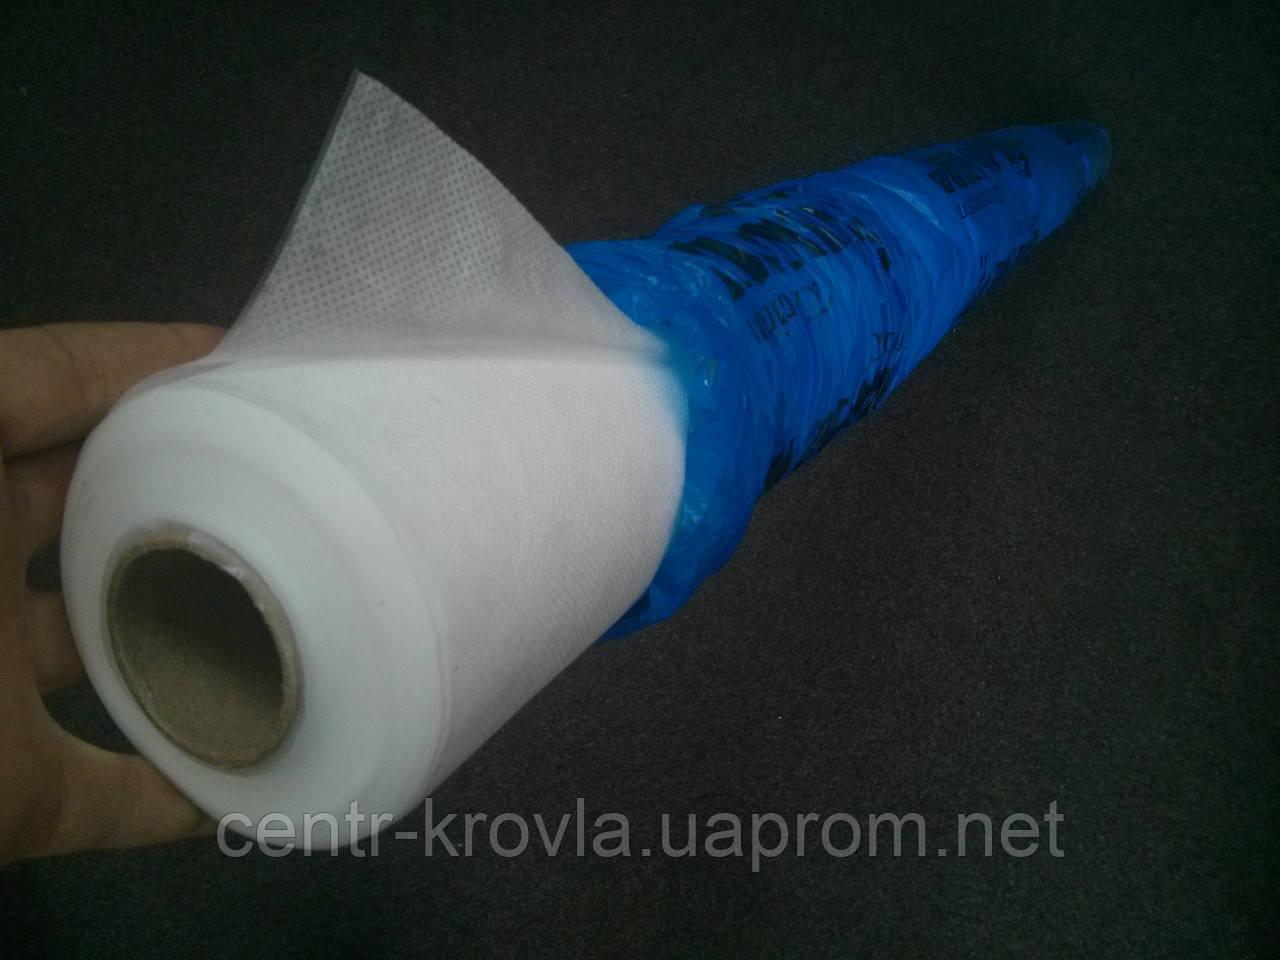 Гидробарьер мембрана Roofer light (35 м. кв.) для металлочерепицы